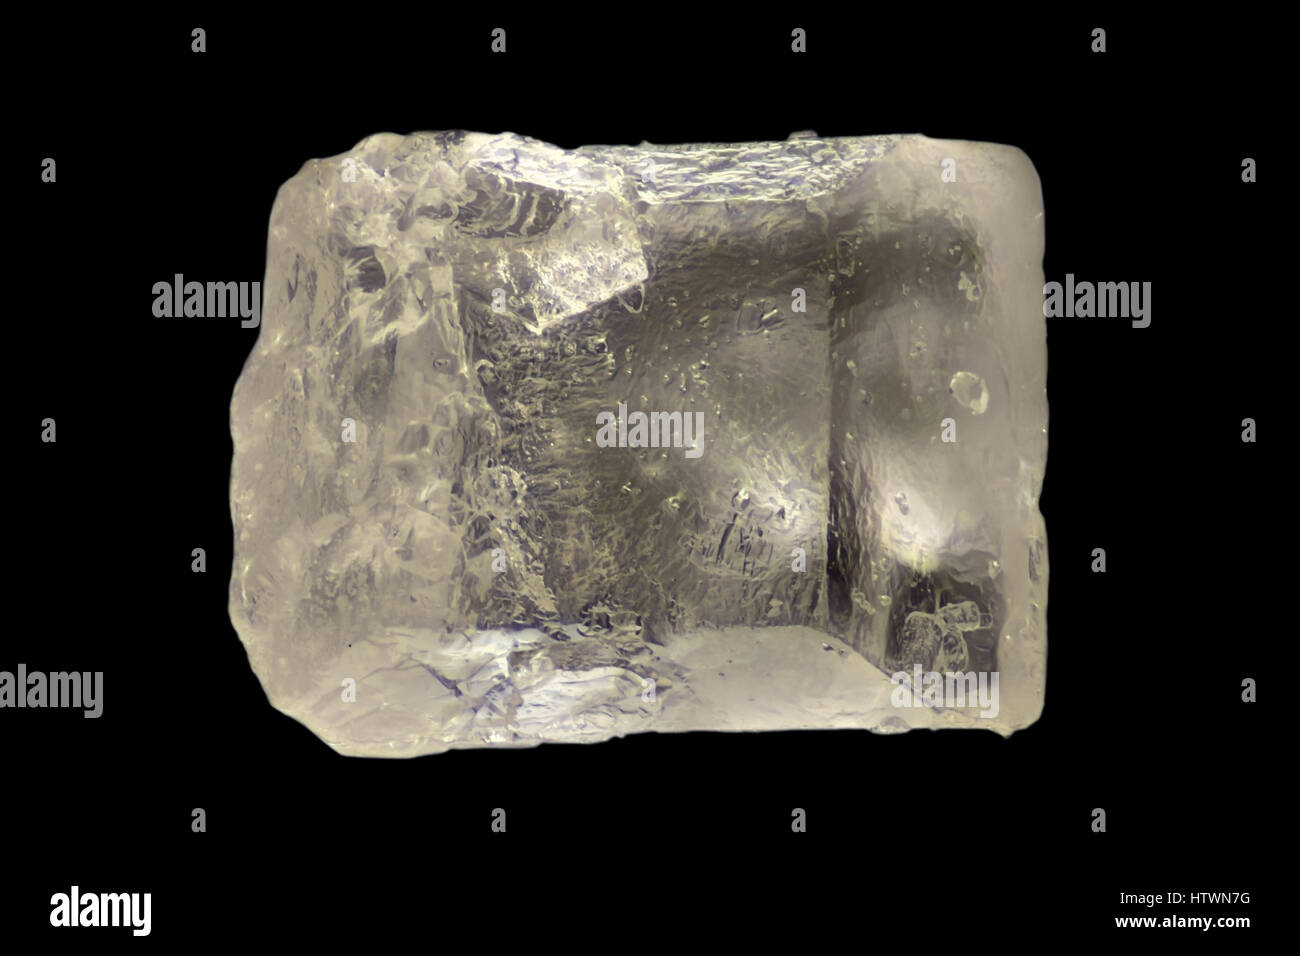 Extreme magnification - Sugar crystal at 20x - Stock Image